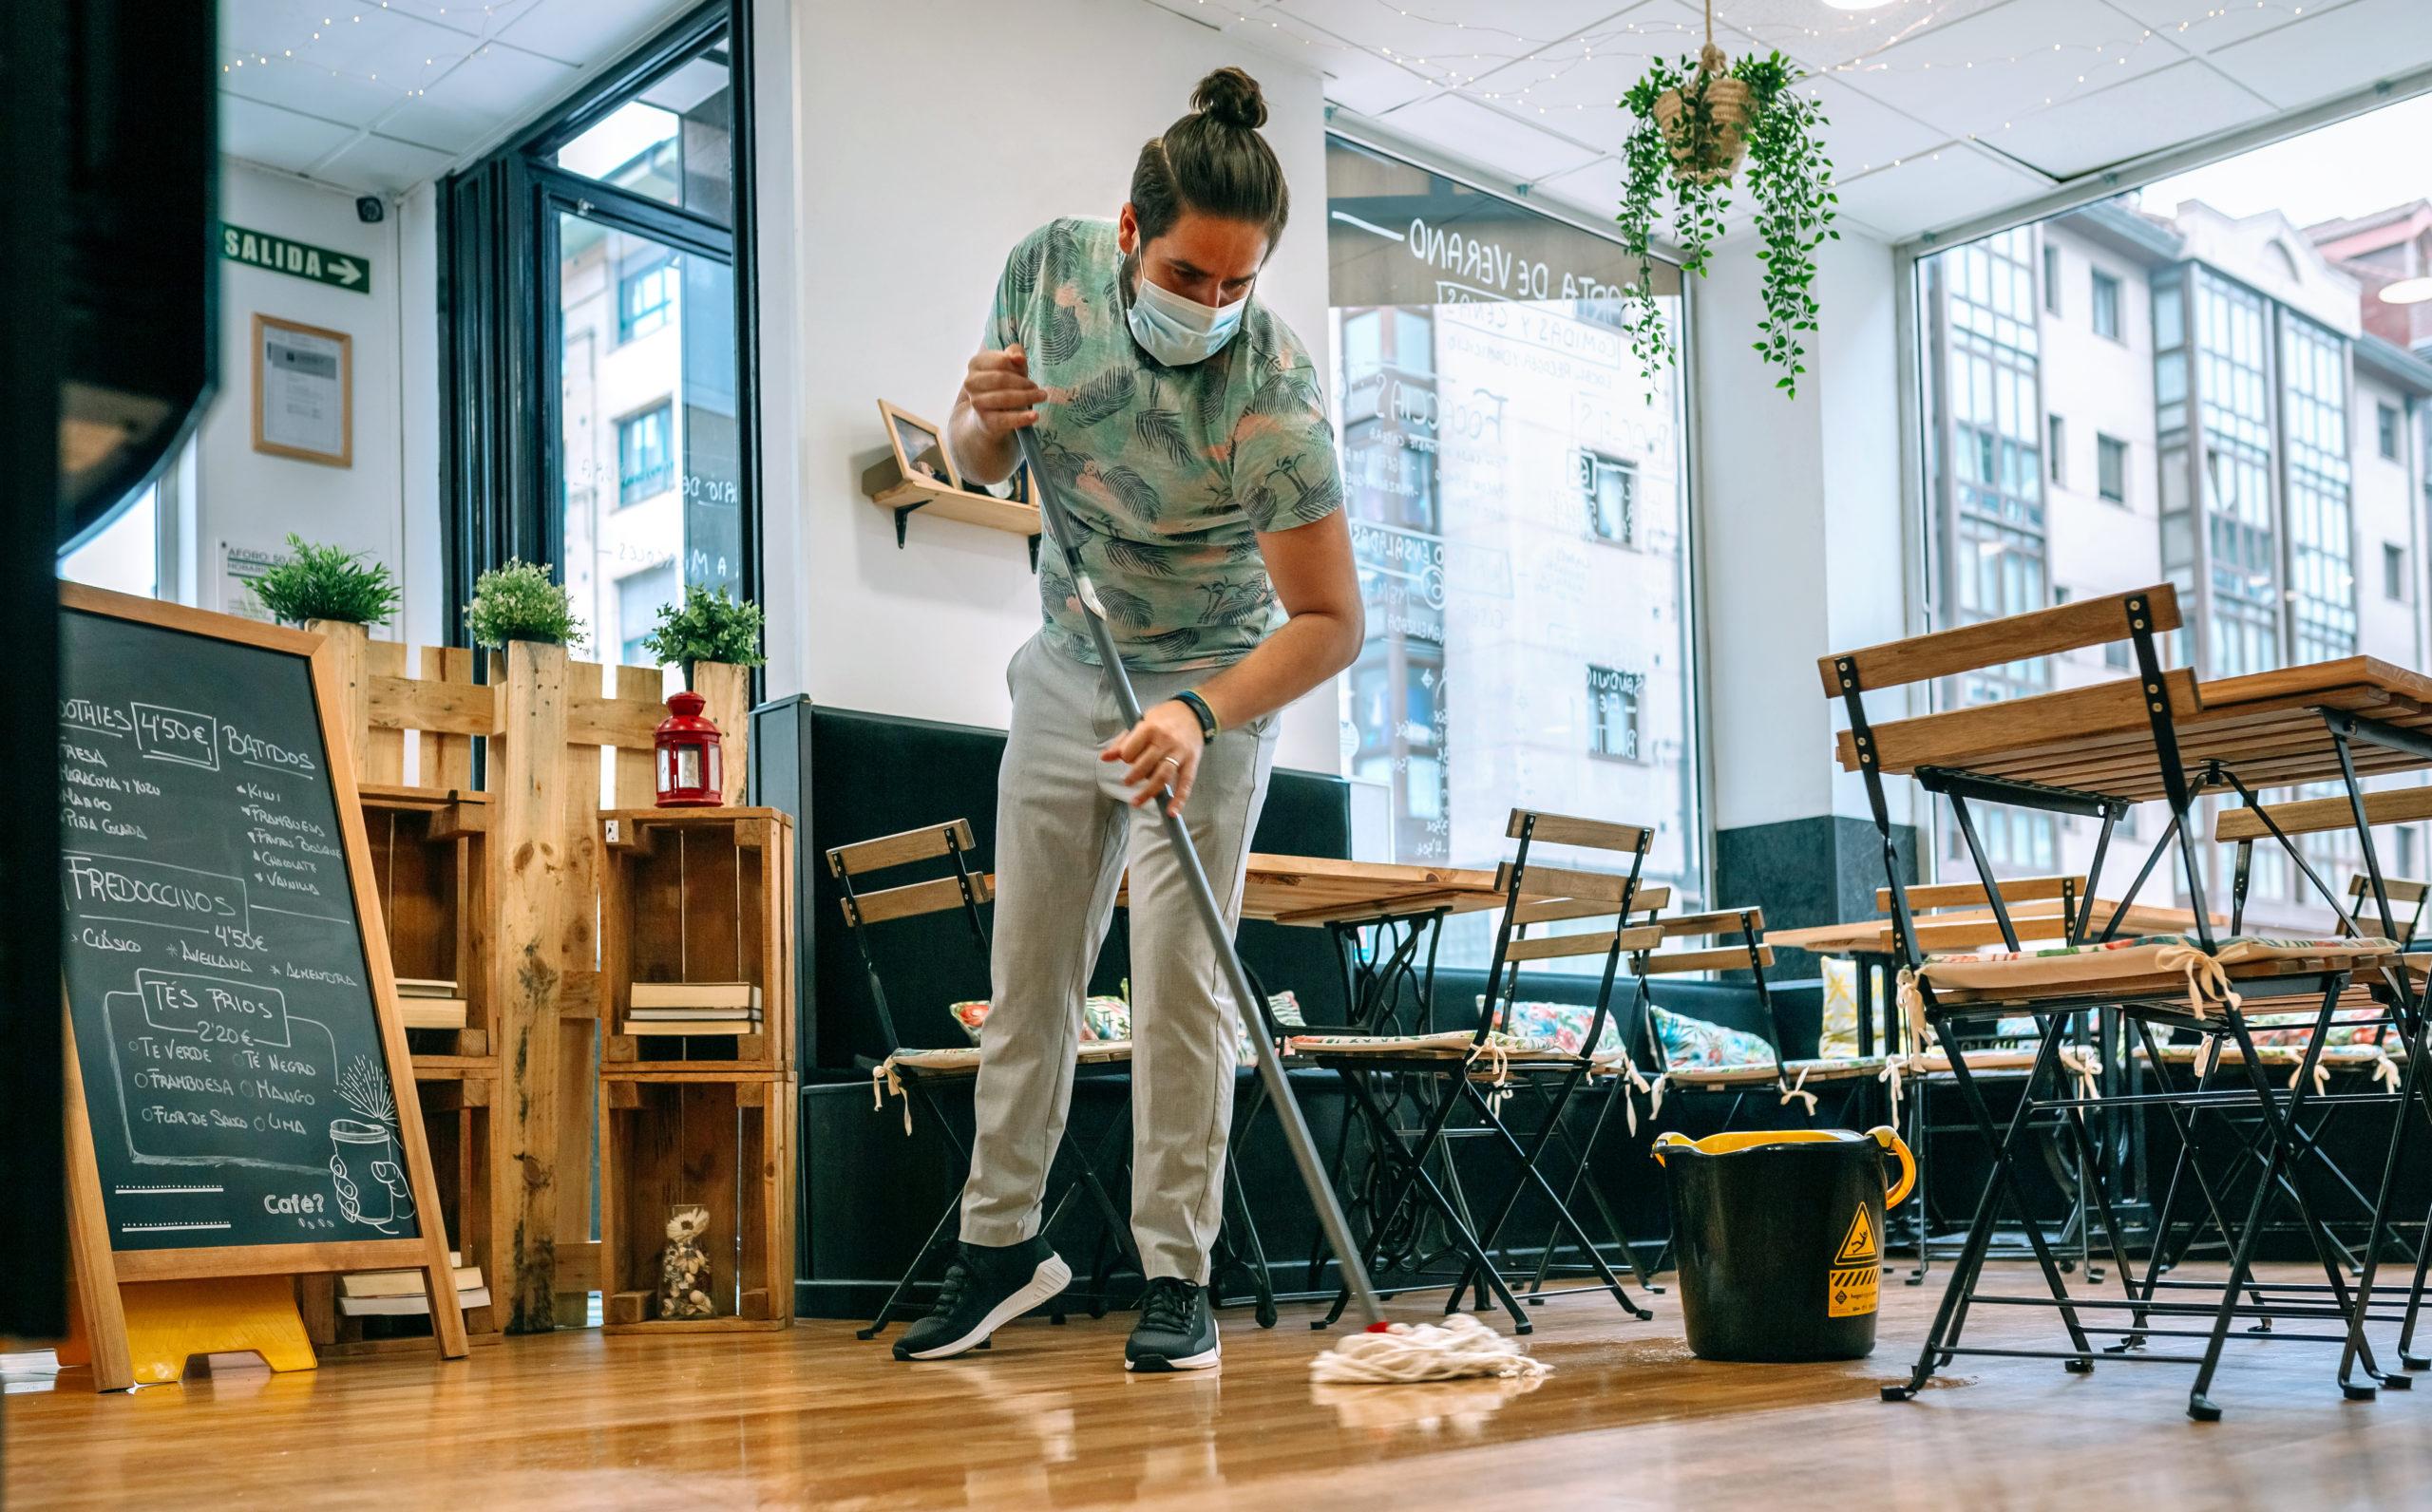 Nettoyage de restaurants & bars Liège